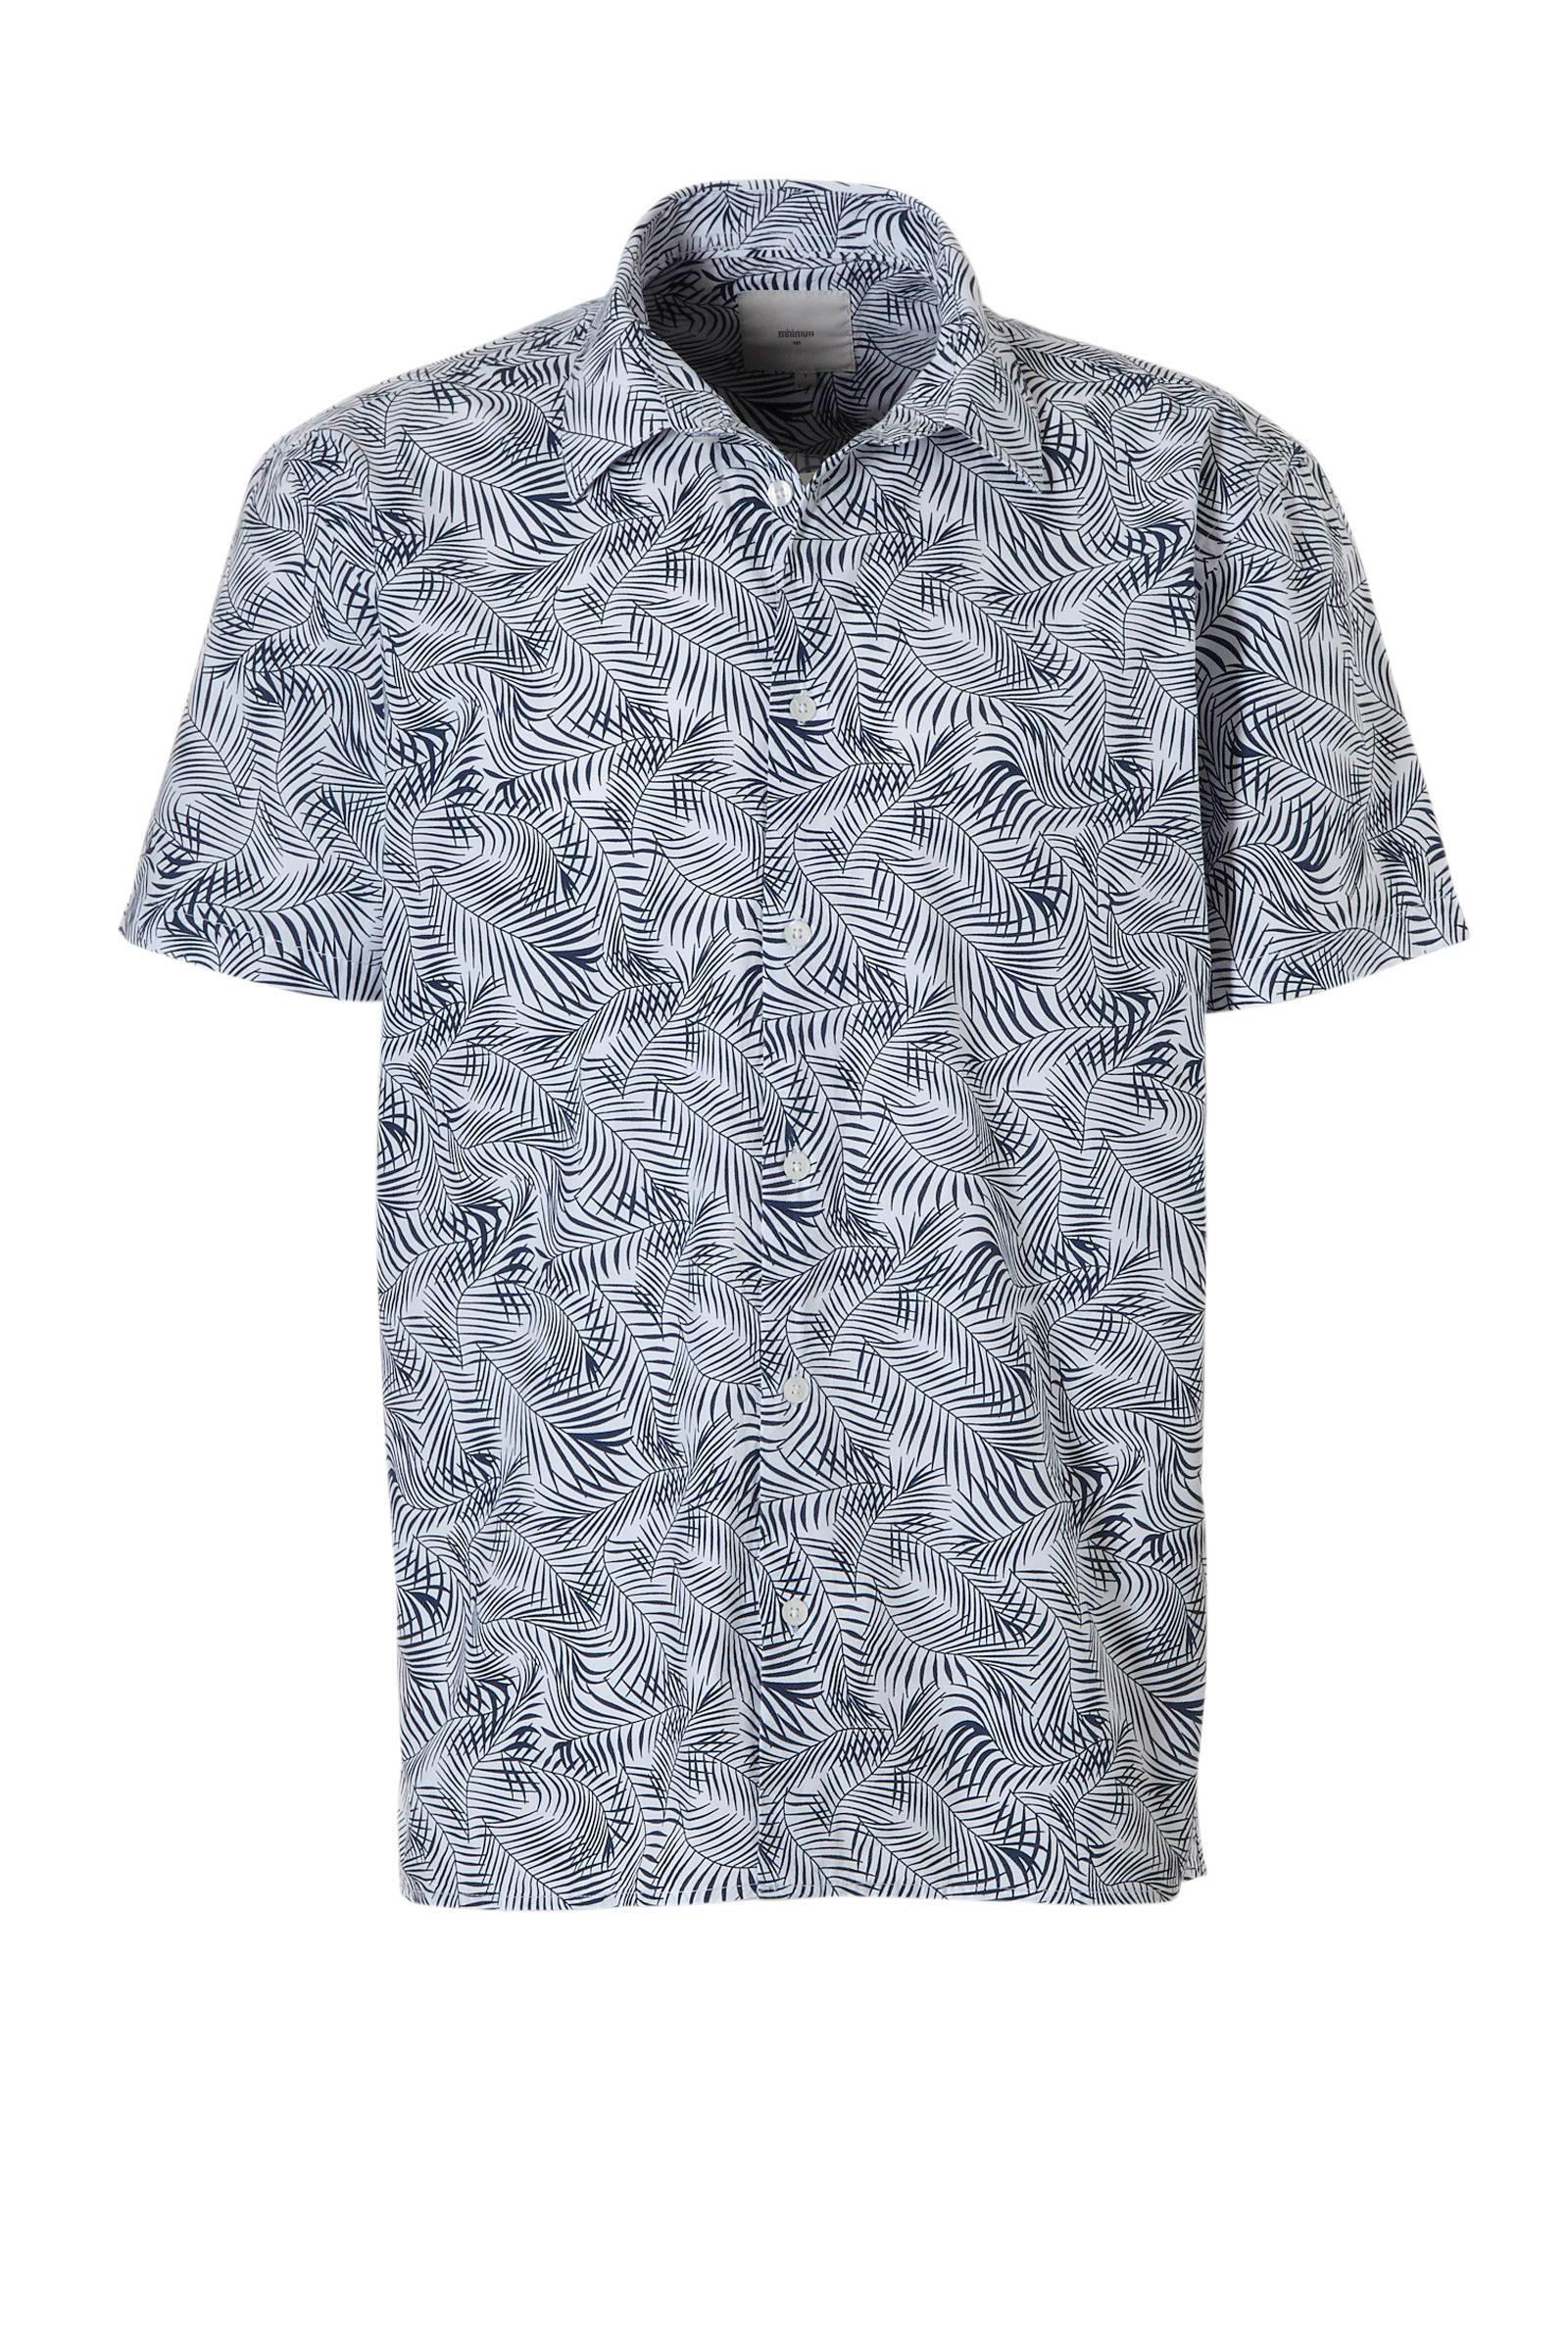 Overhemd Minimum Fit Regular Met PrintWehkamp xBoWdrCe